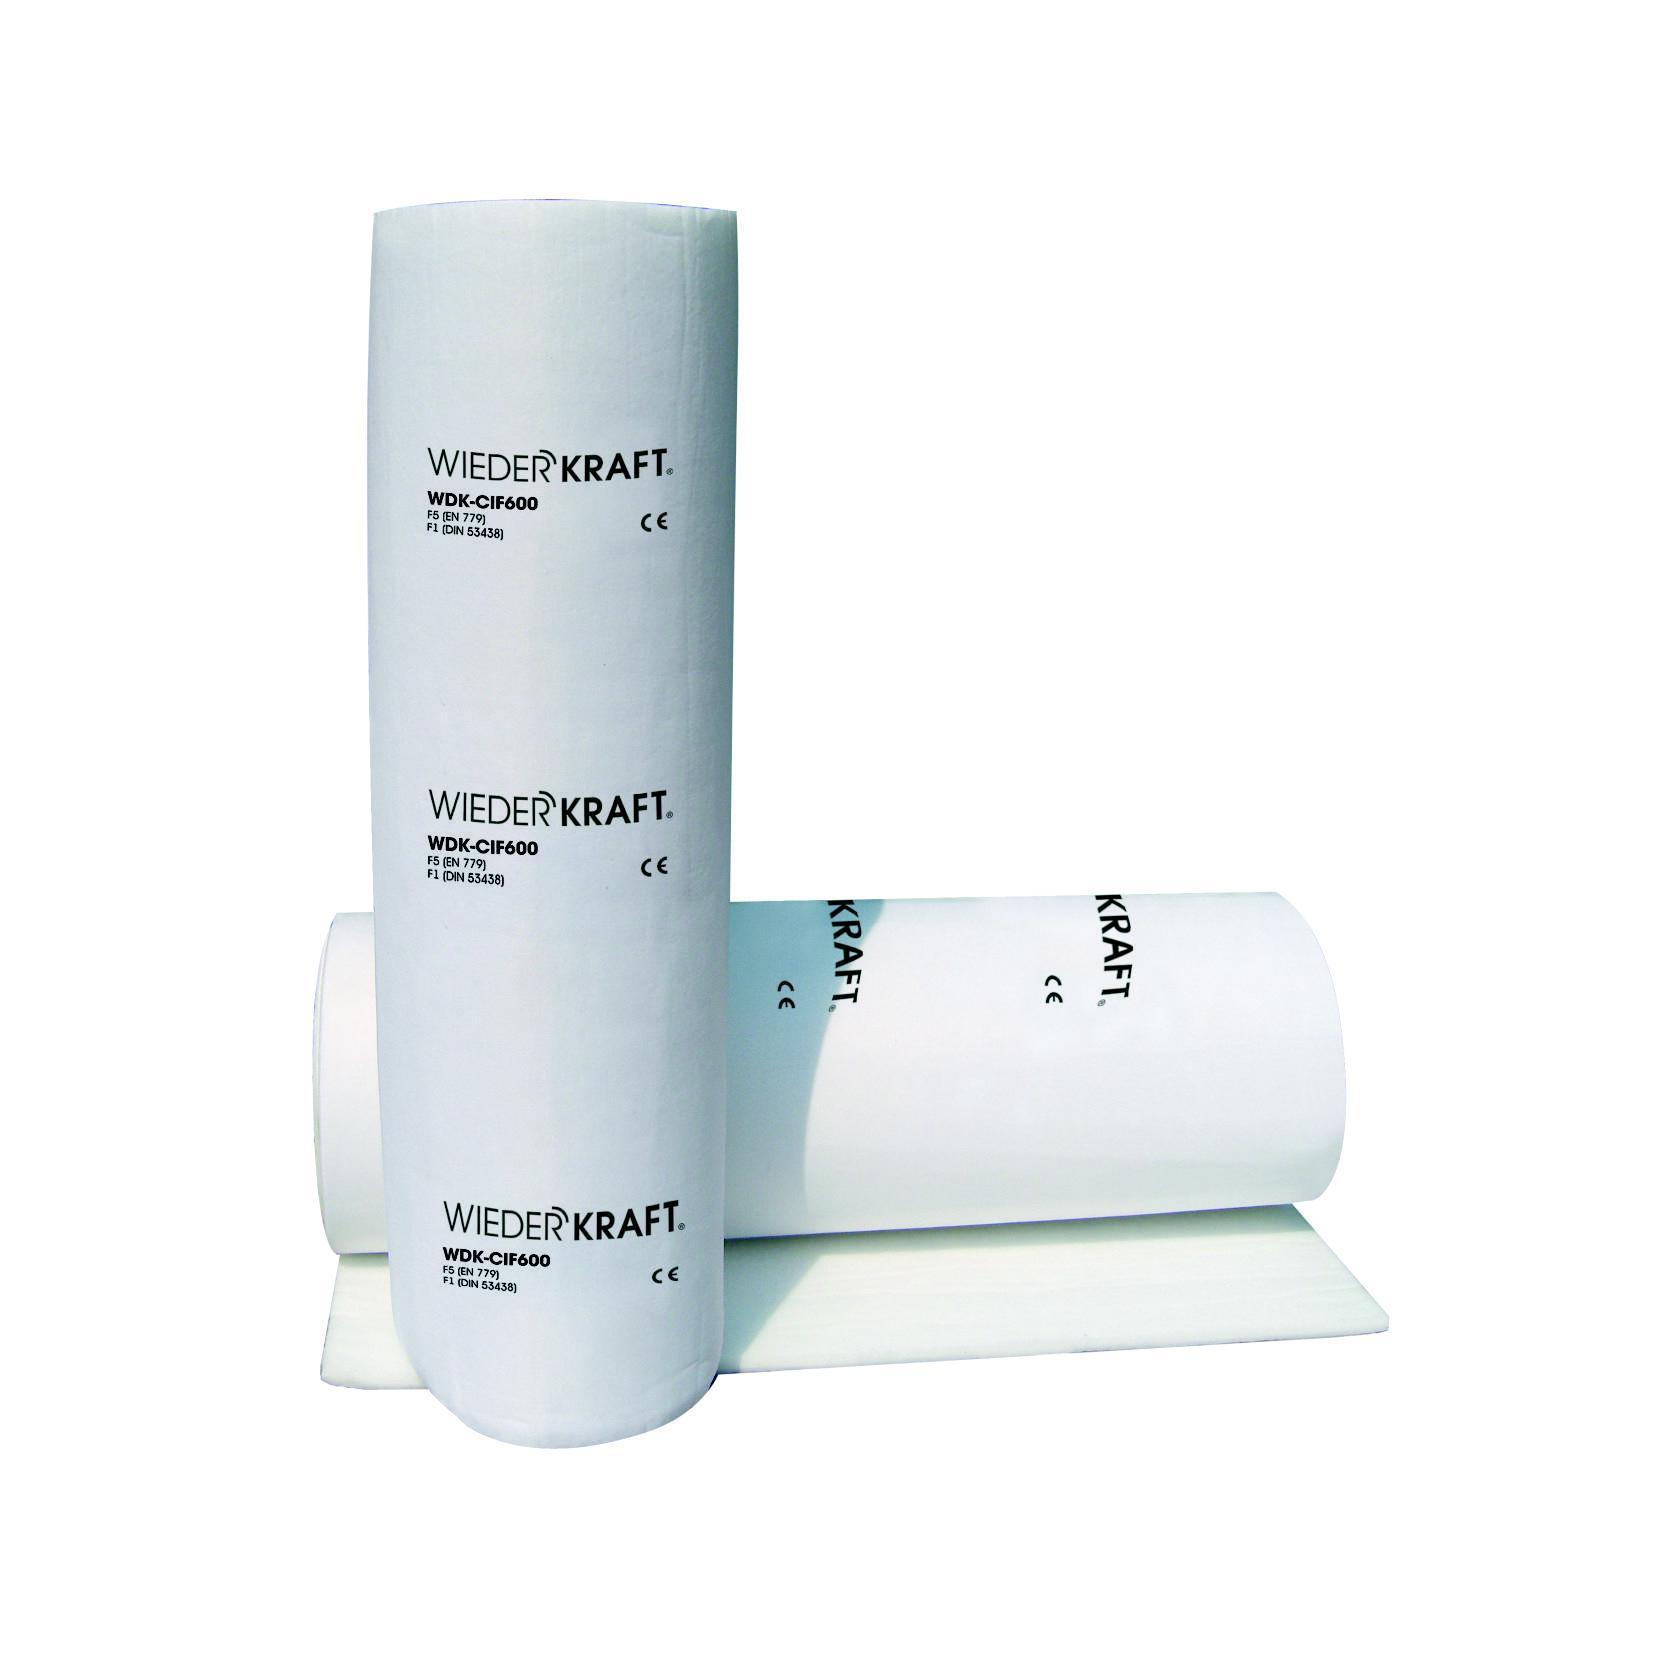 Фильтр Wiederkraft Wdk-cif600 (1м х 20м) домкрат wiederkraft wdk 81020